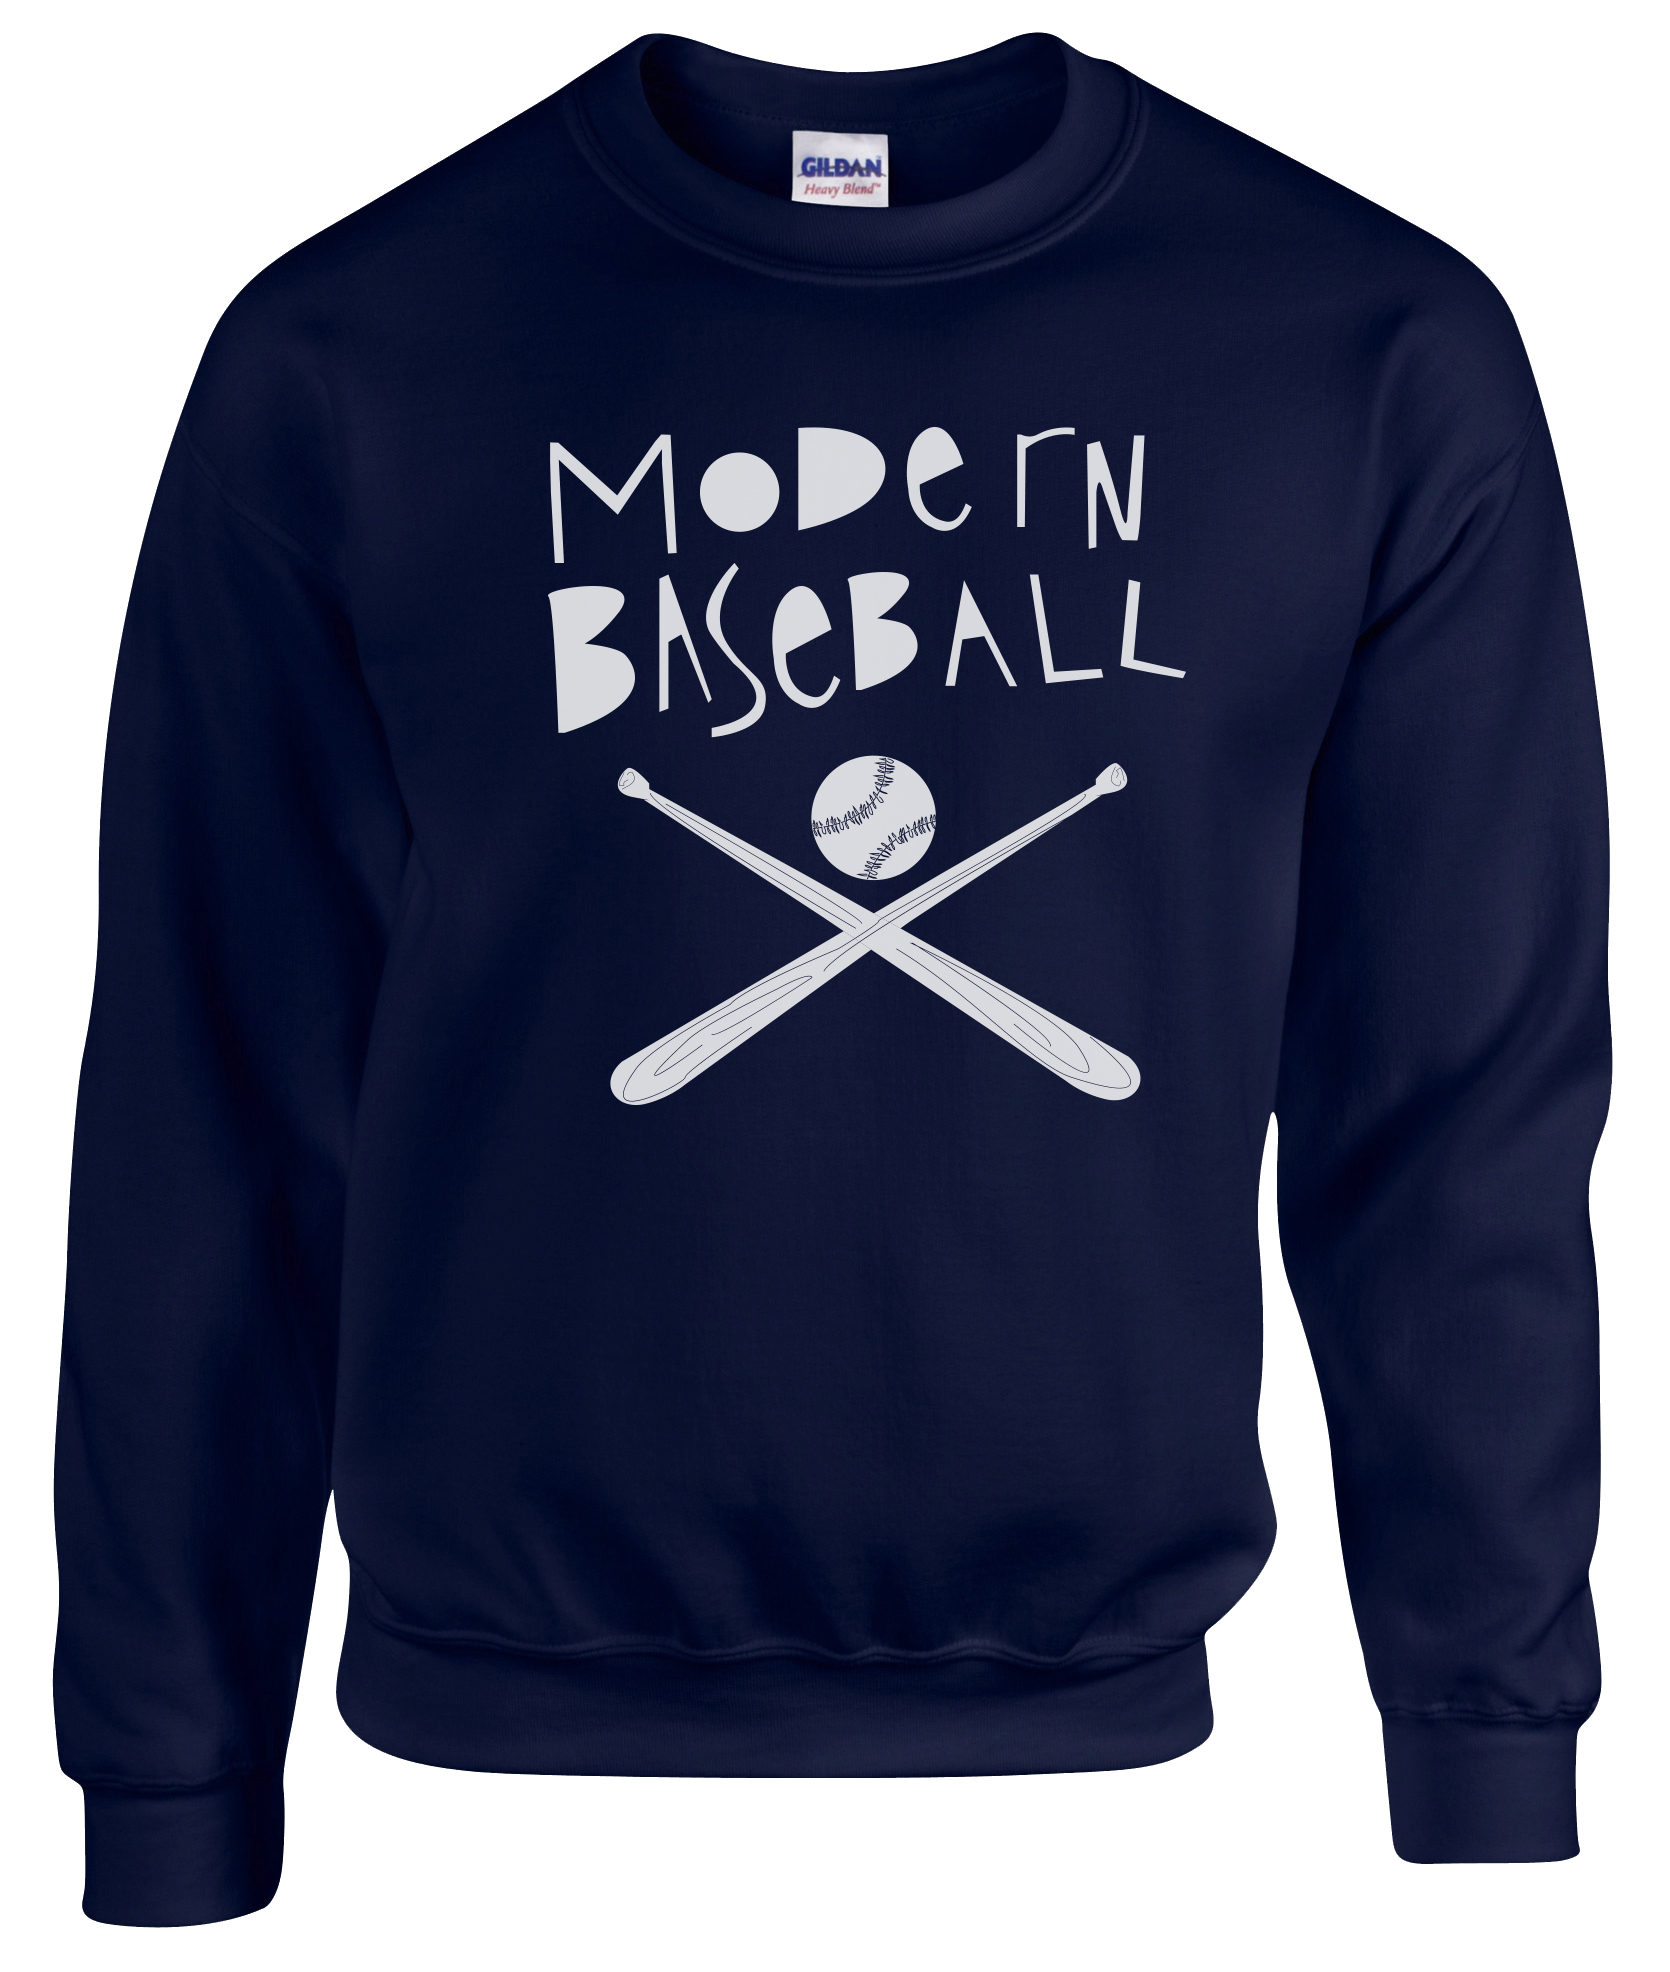 Modern Baseball - Baseball Bat Crewneck Sweatshirt - Navy